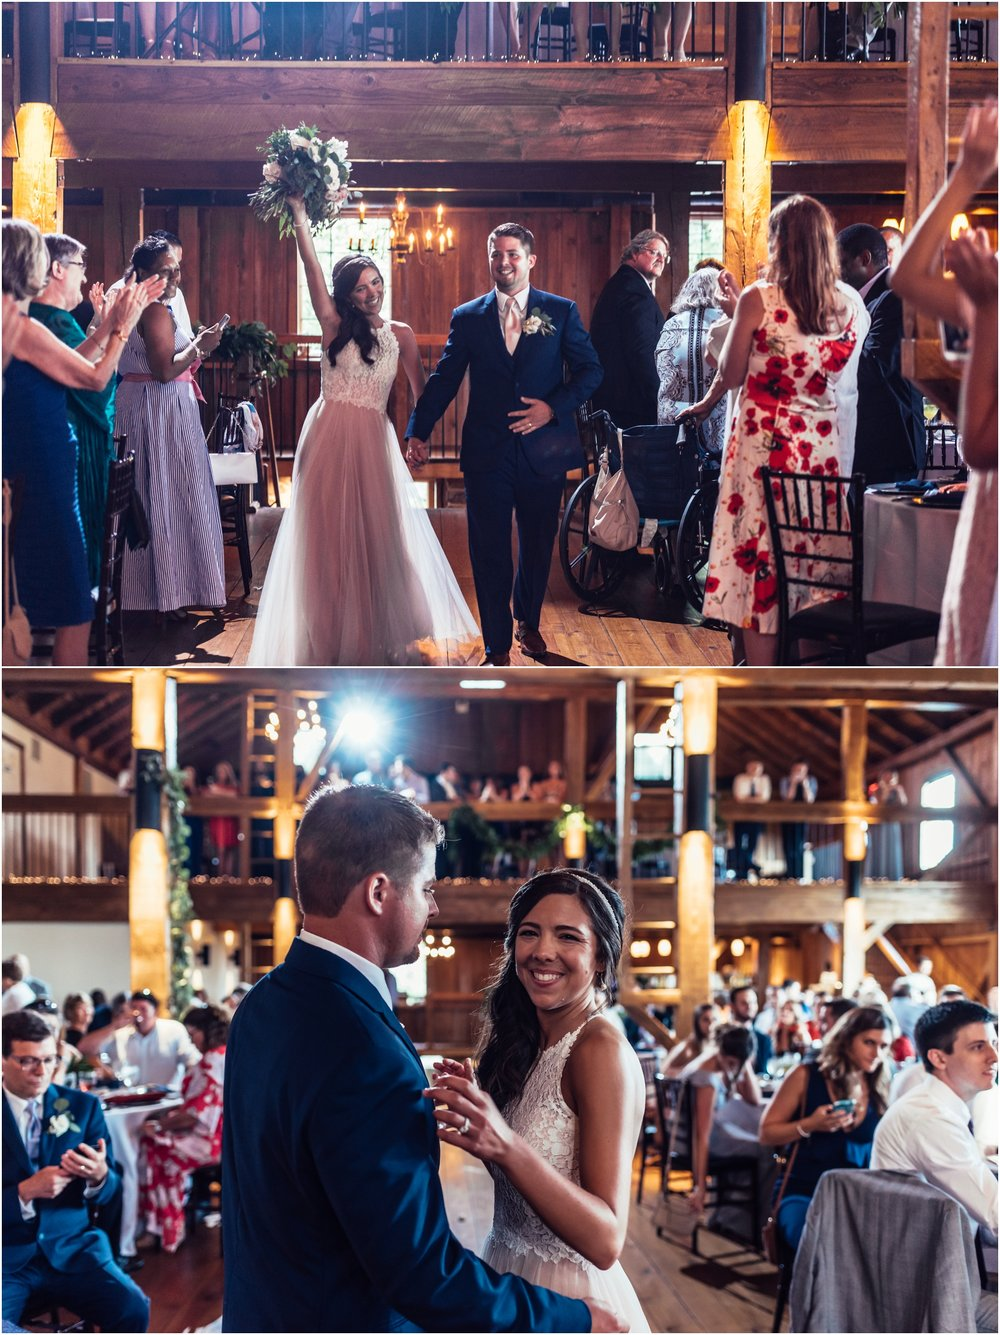 Steph&Bryan_Lancaster_wedding_farm_0537.jpg